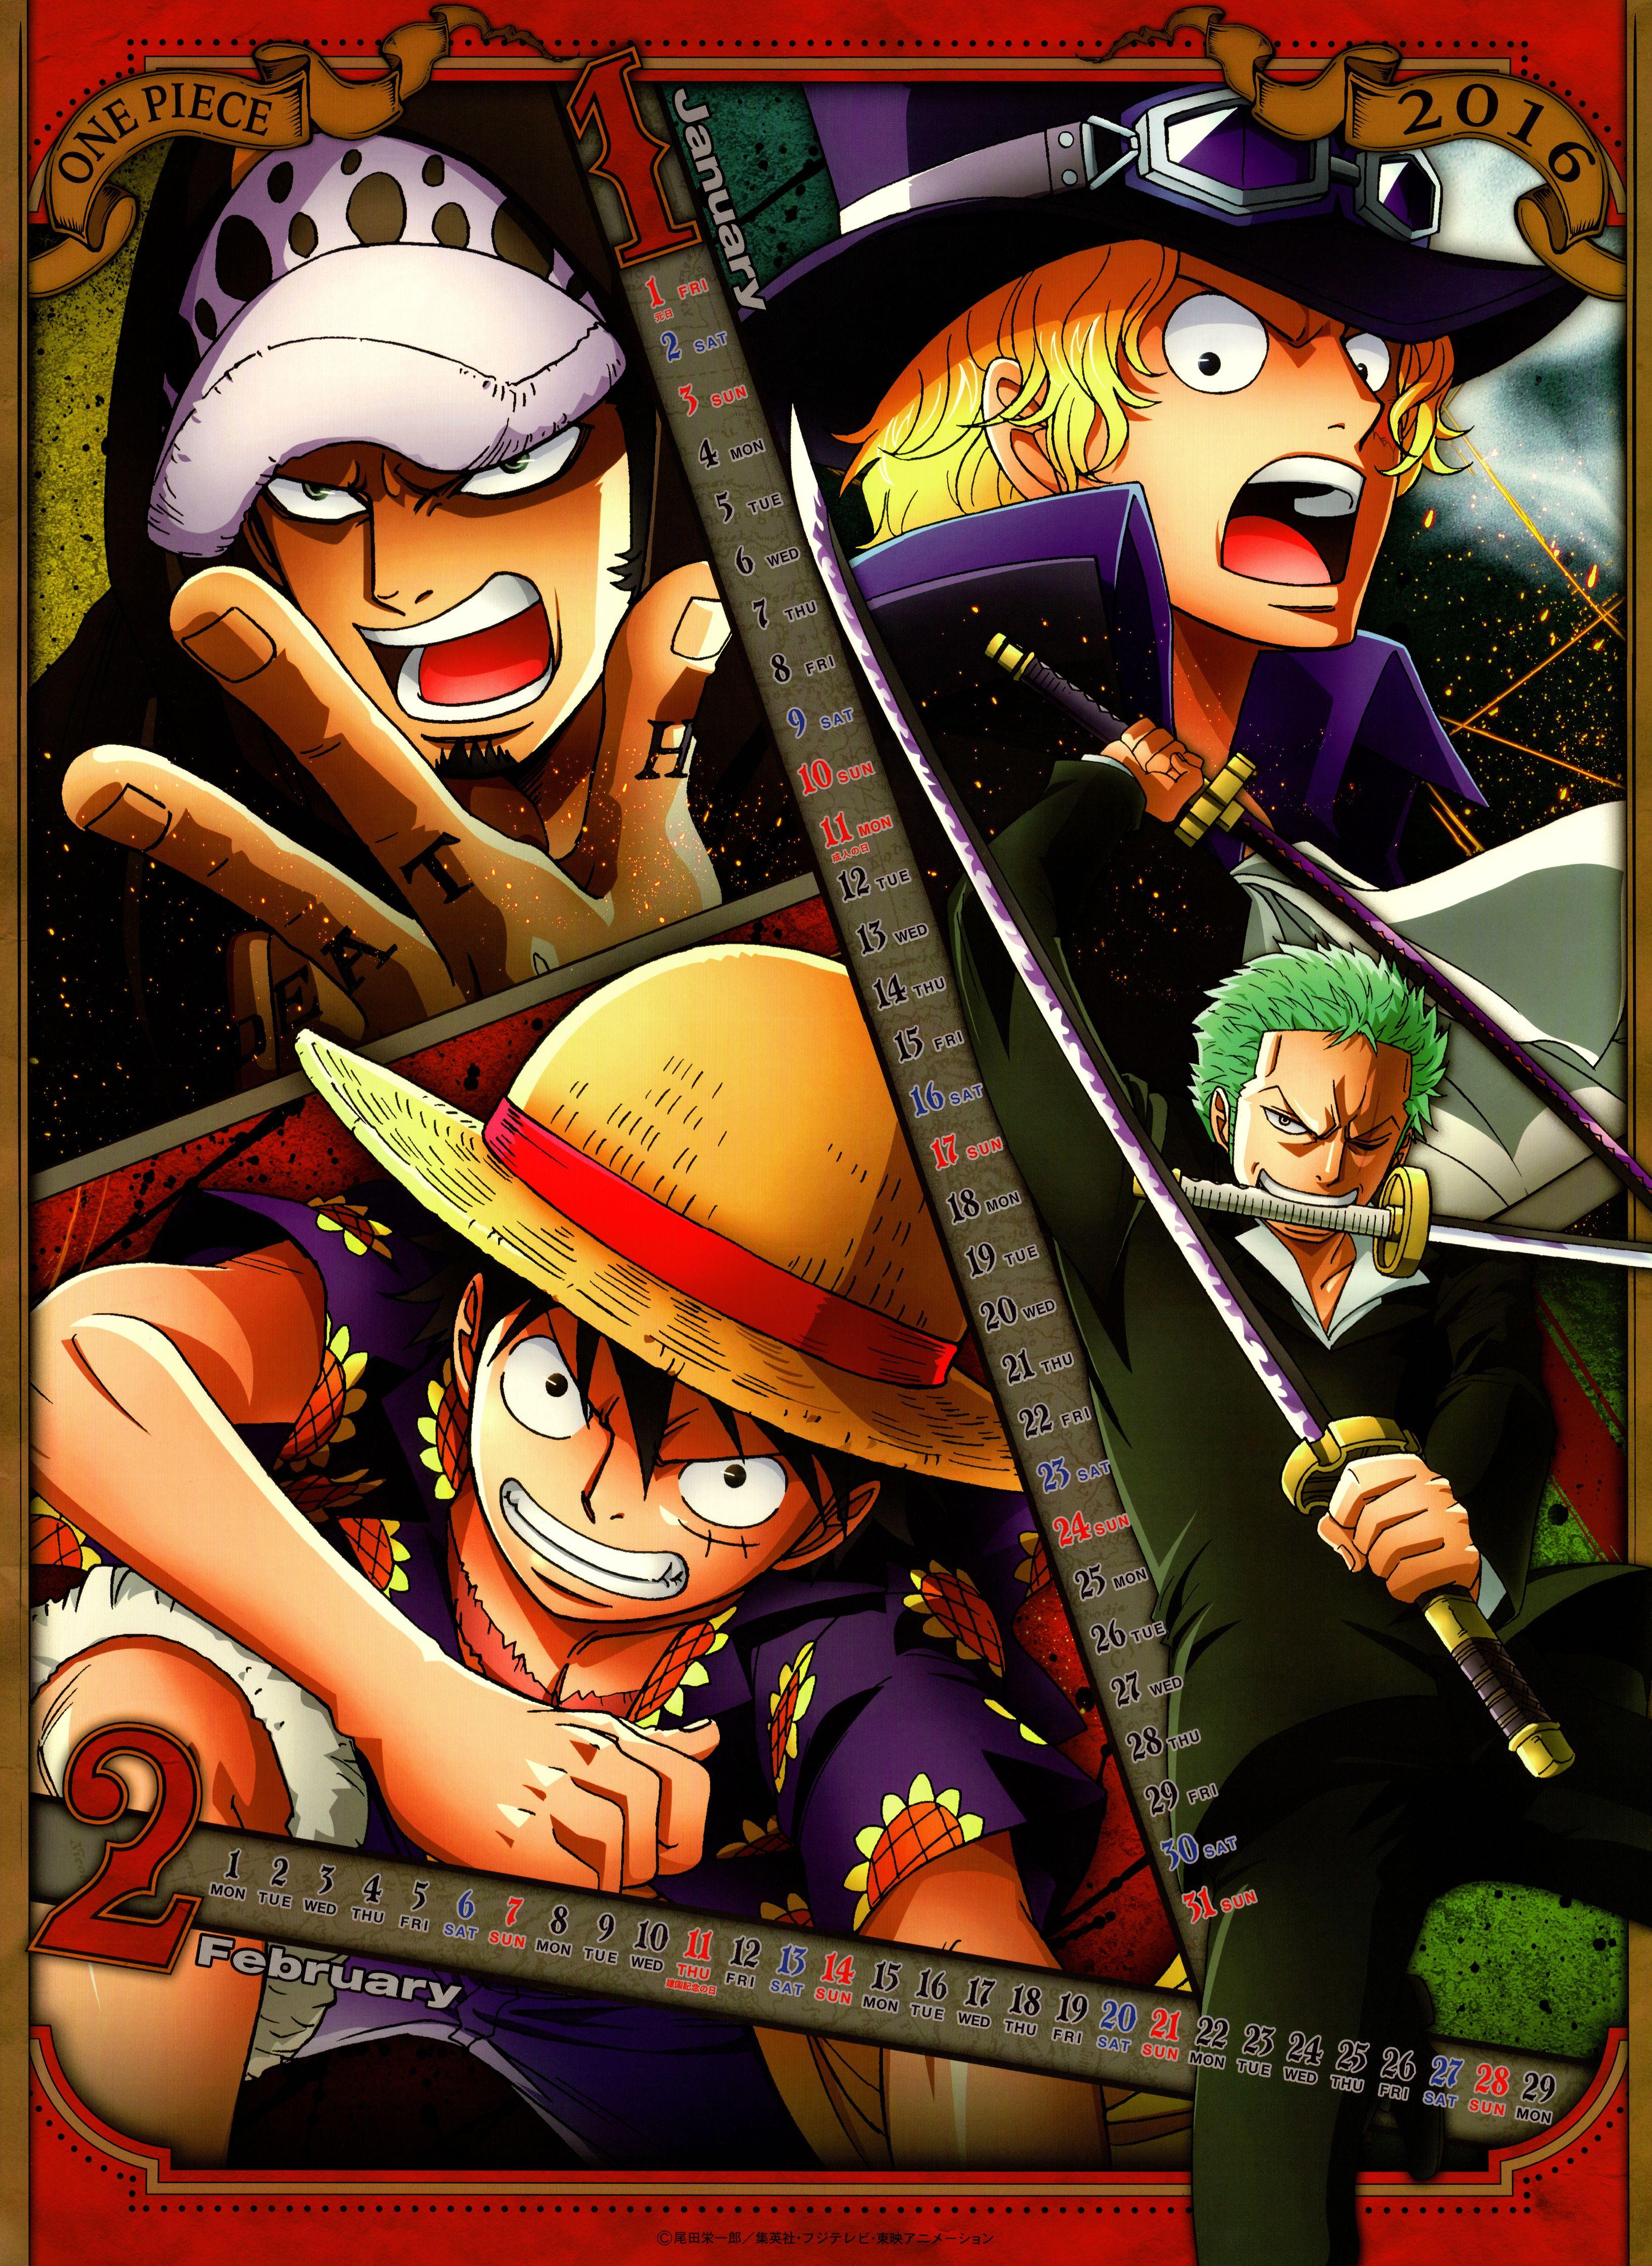 Toei Animation One Piece One Piece 2016 Calendar Roronoa Zoro